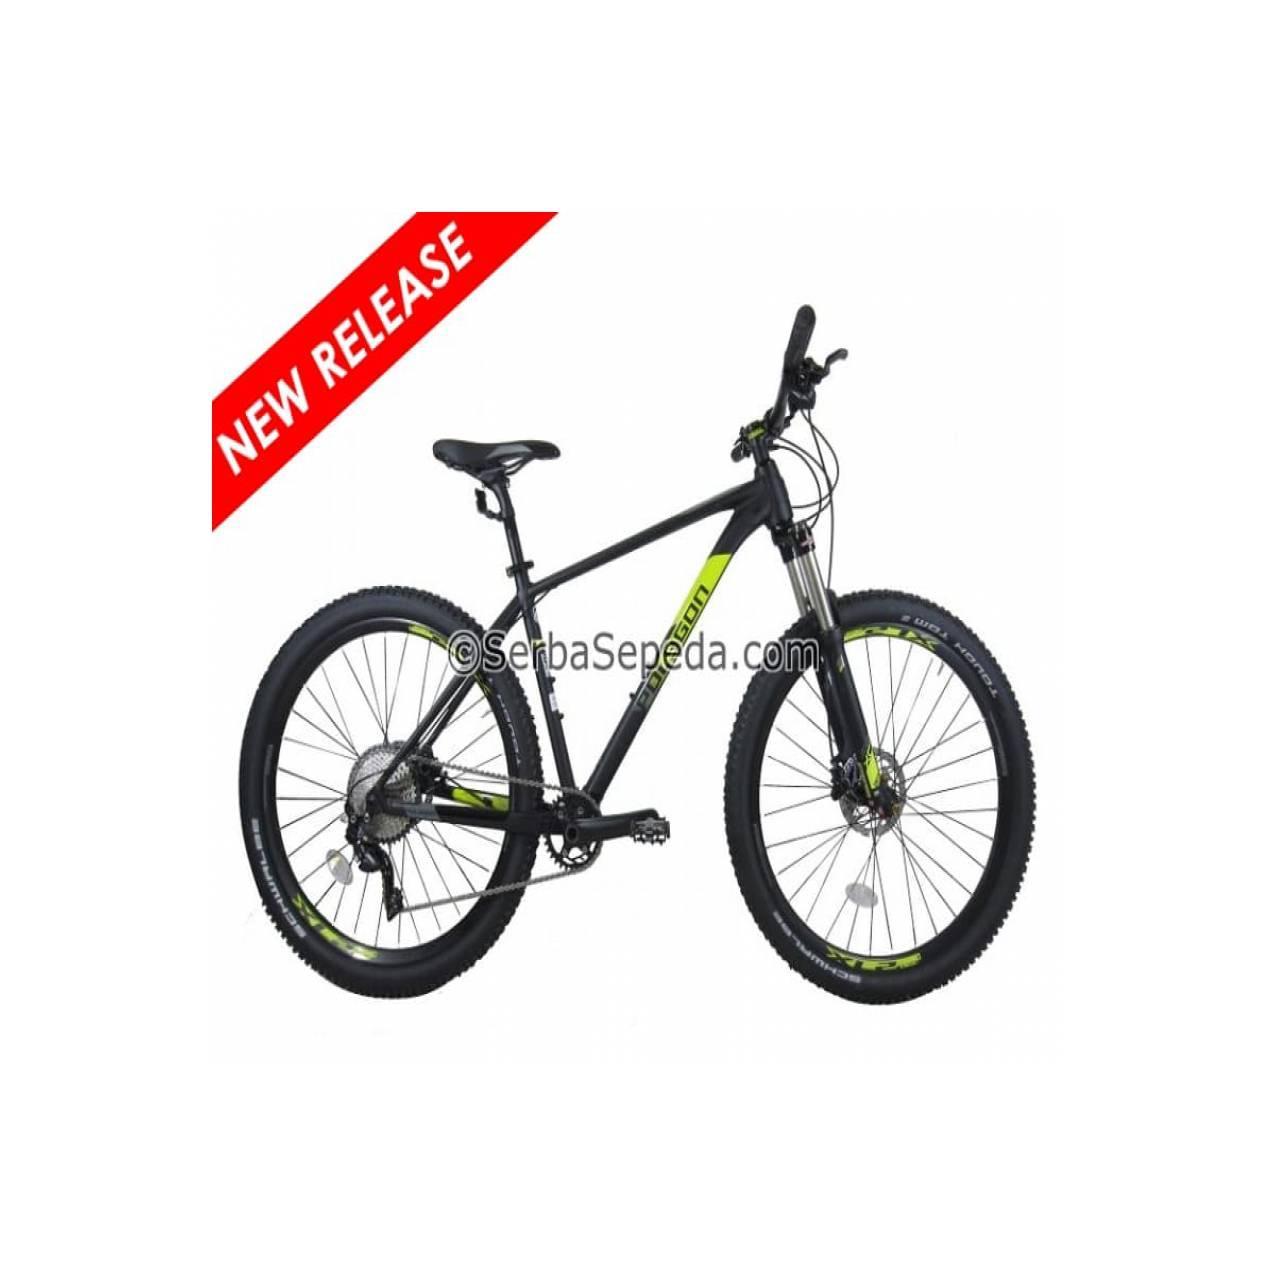 Sepeda Gunung Polygon Xtrada 7 2018 27.5